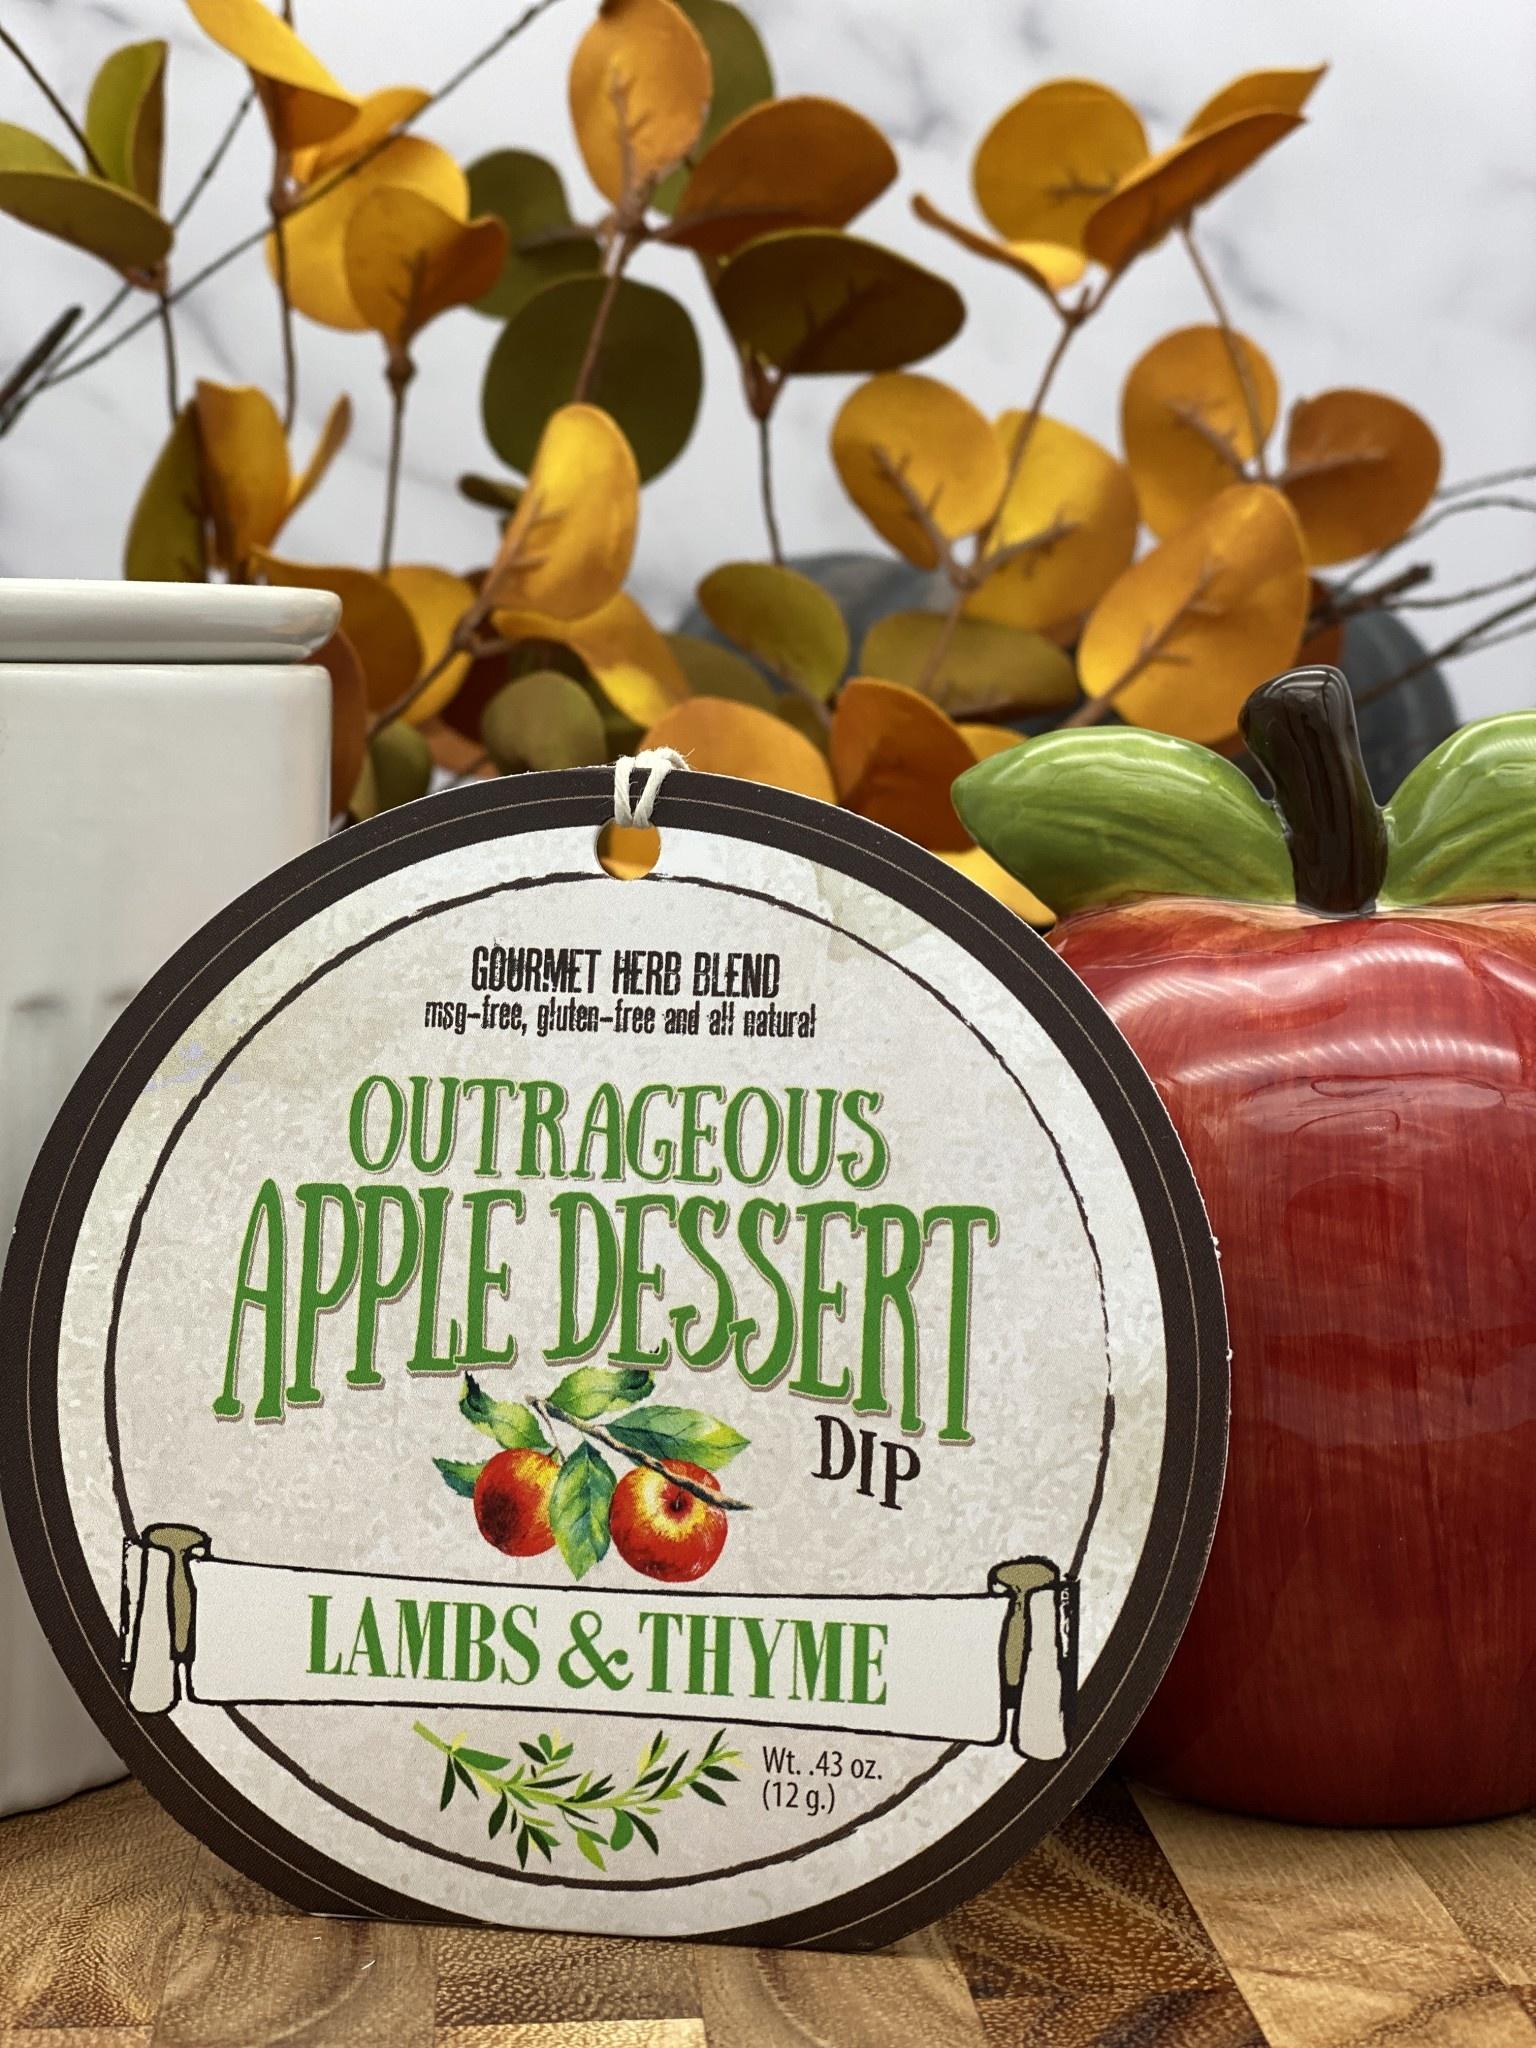 Lambs & Thyme Sweeter Dips Apple